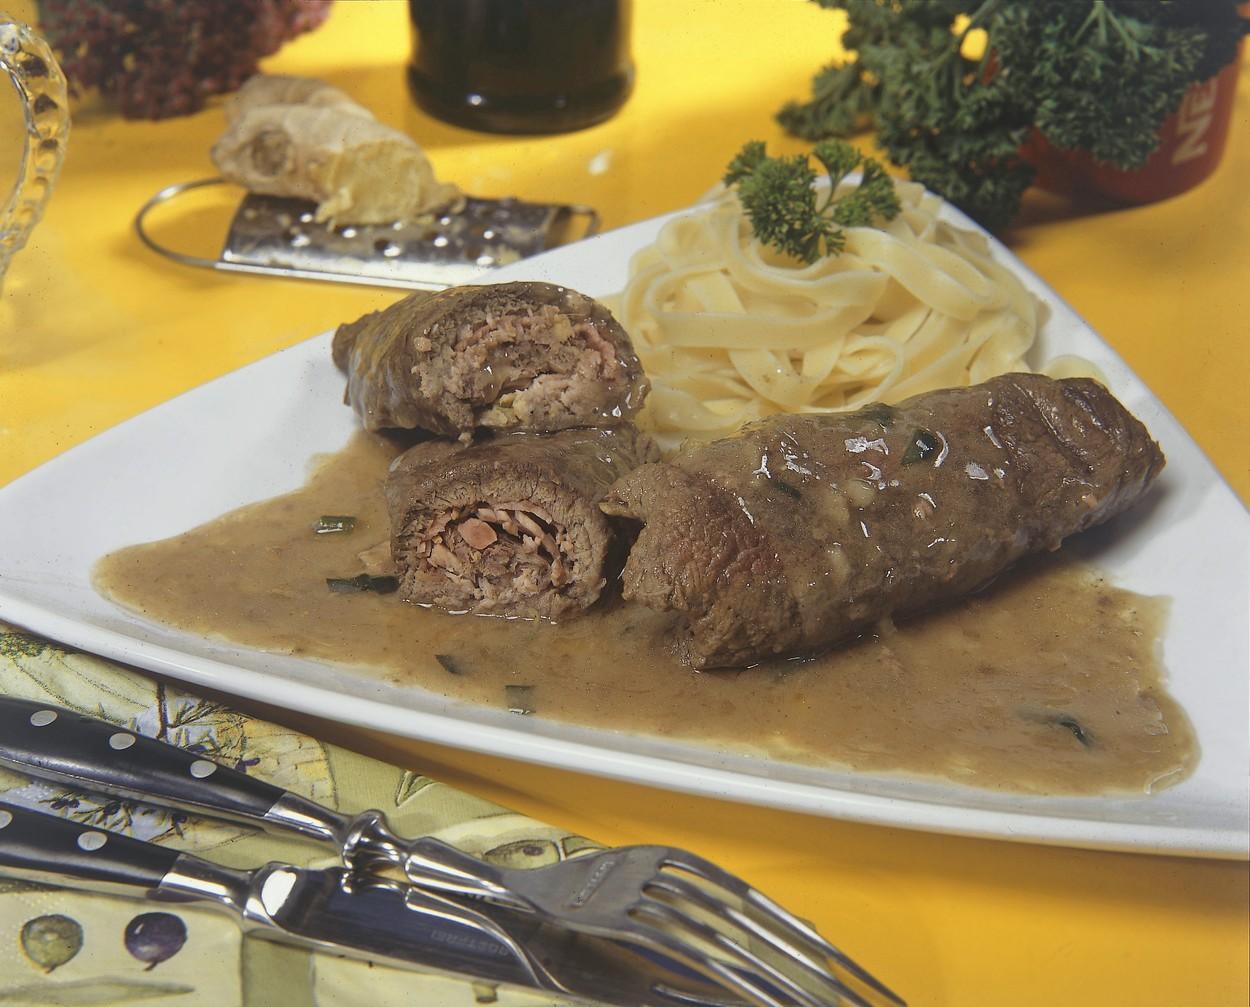 Hovz maso co o nm mon nevte | alahlia.info